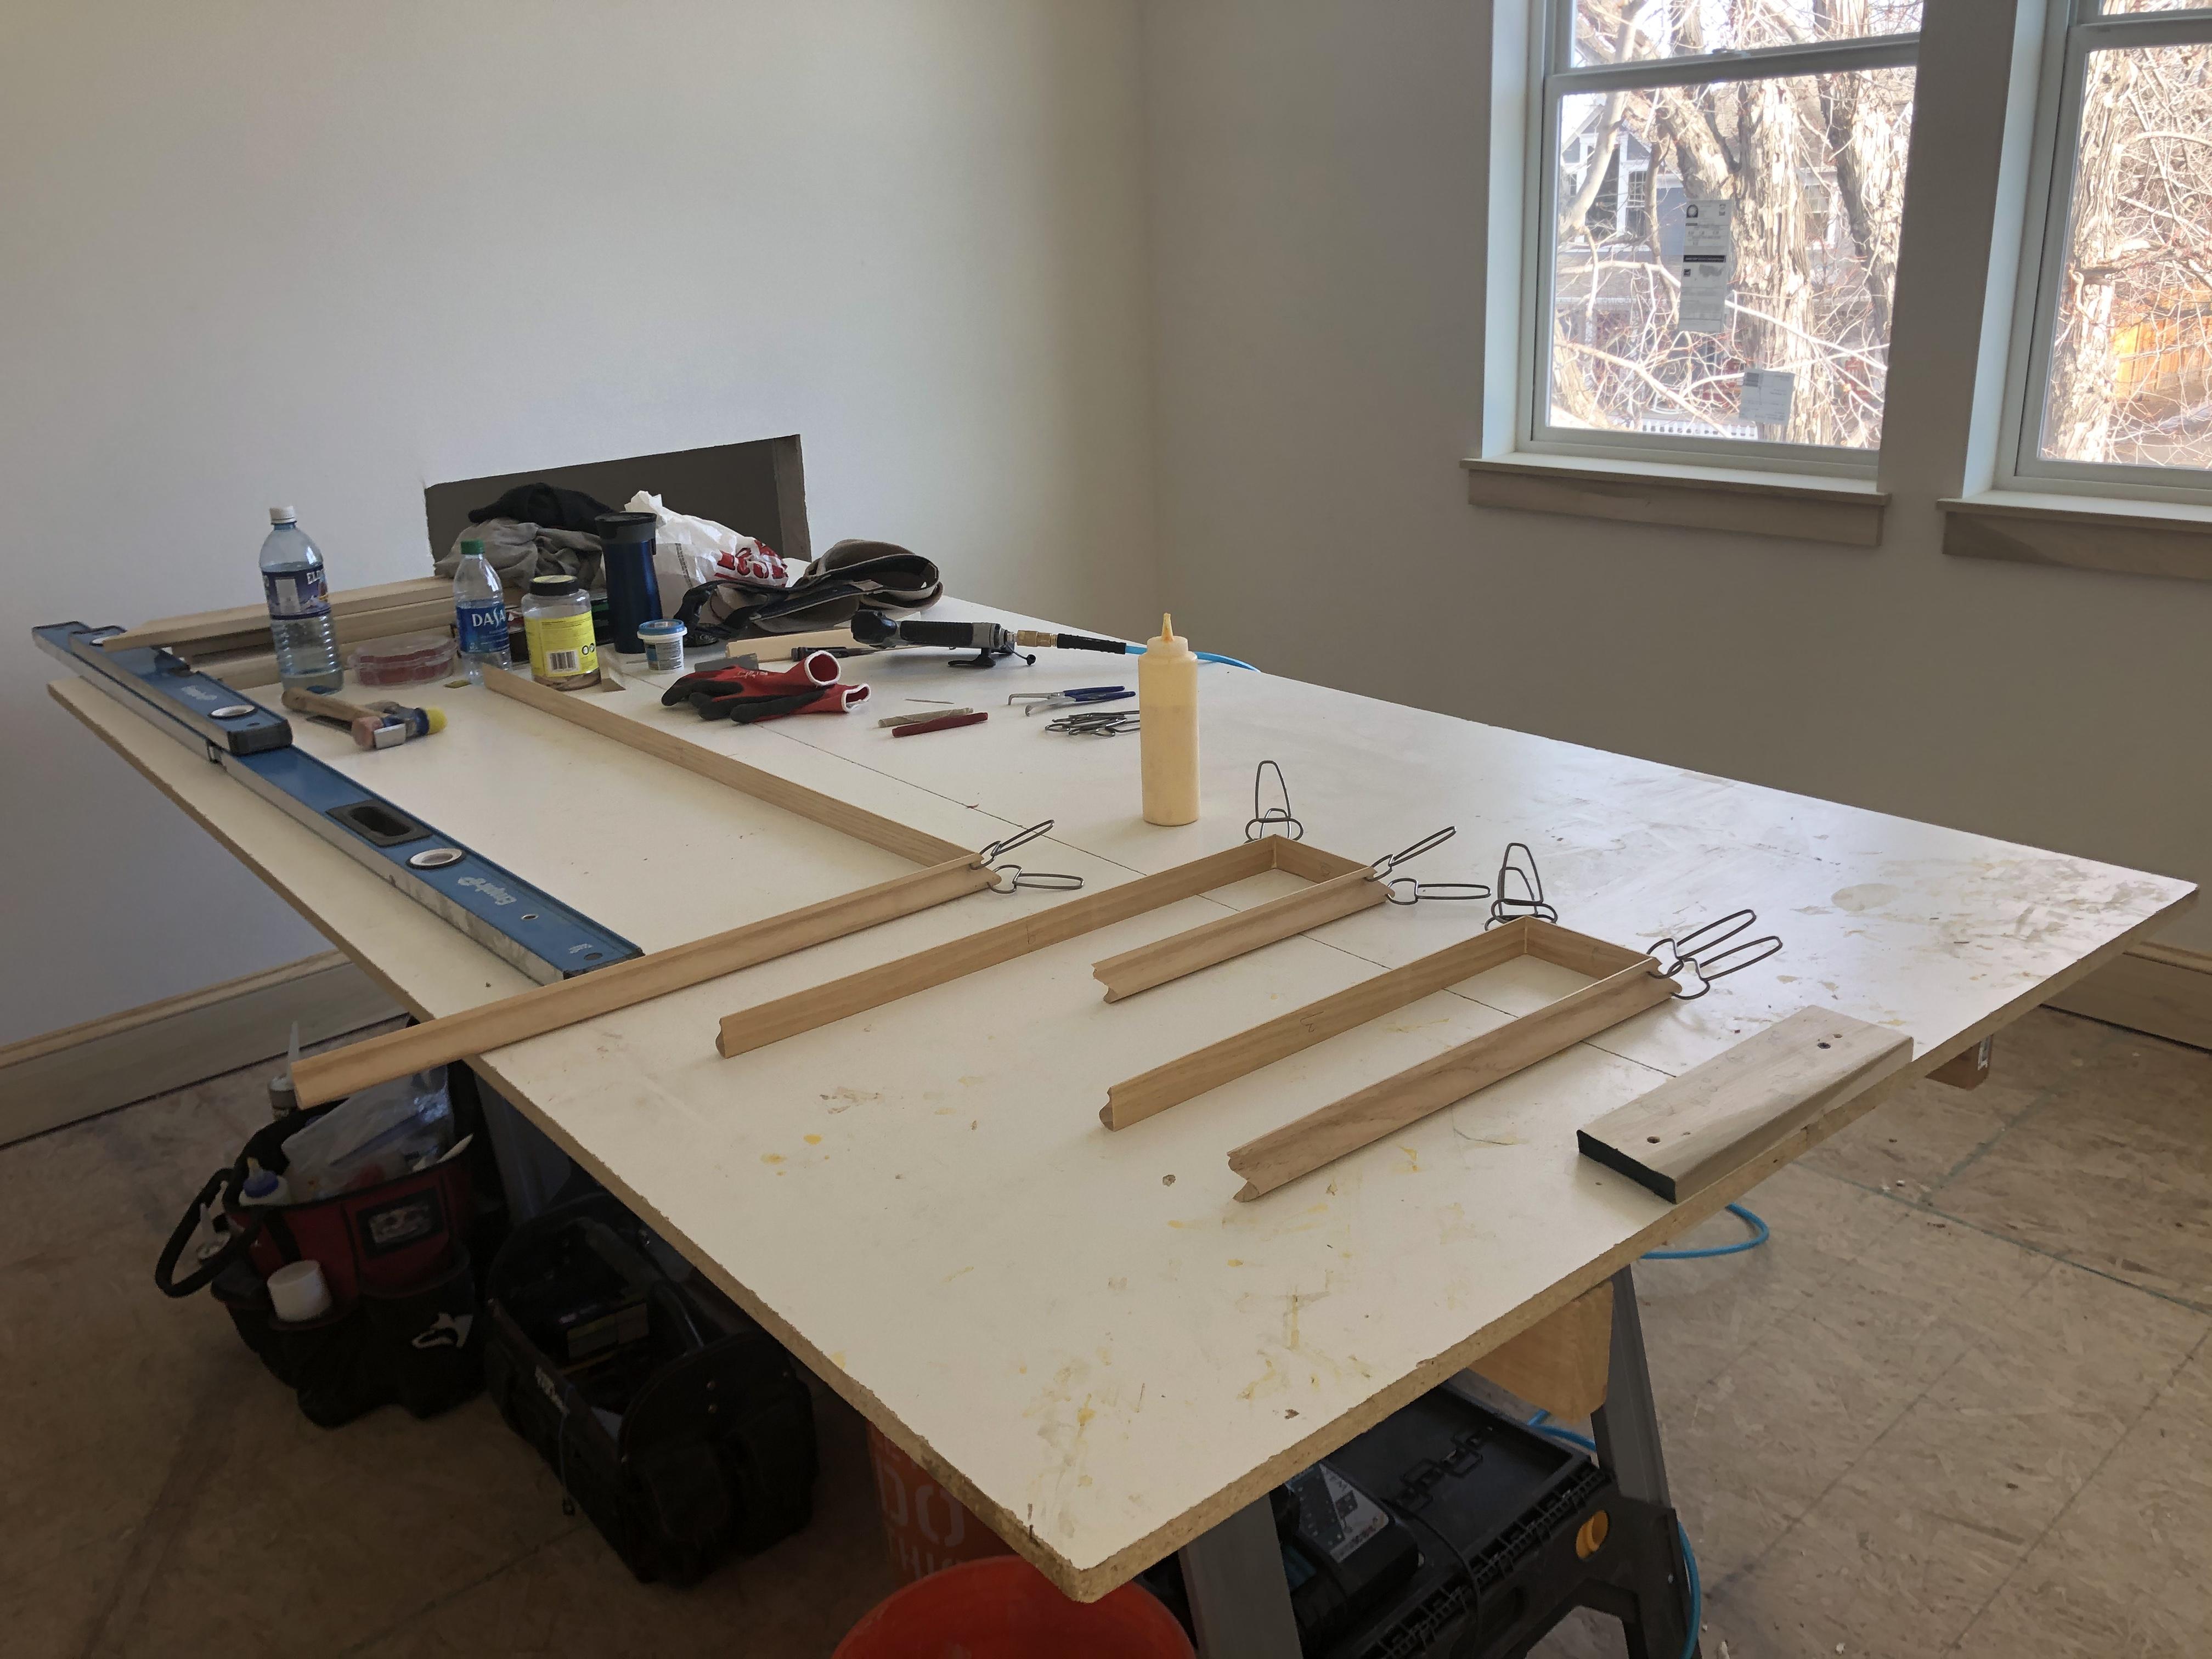 Pre-assemble moulding baseboard casing trim